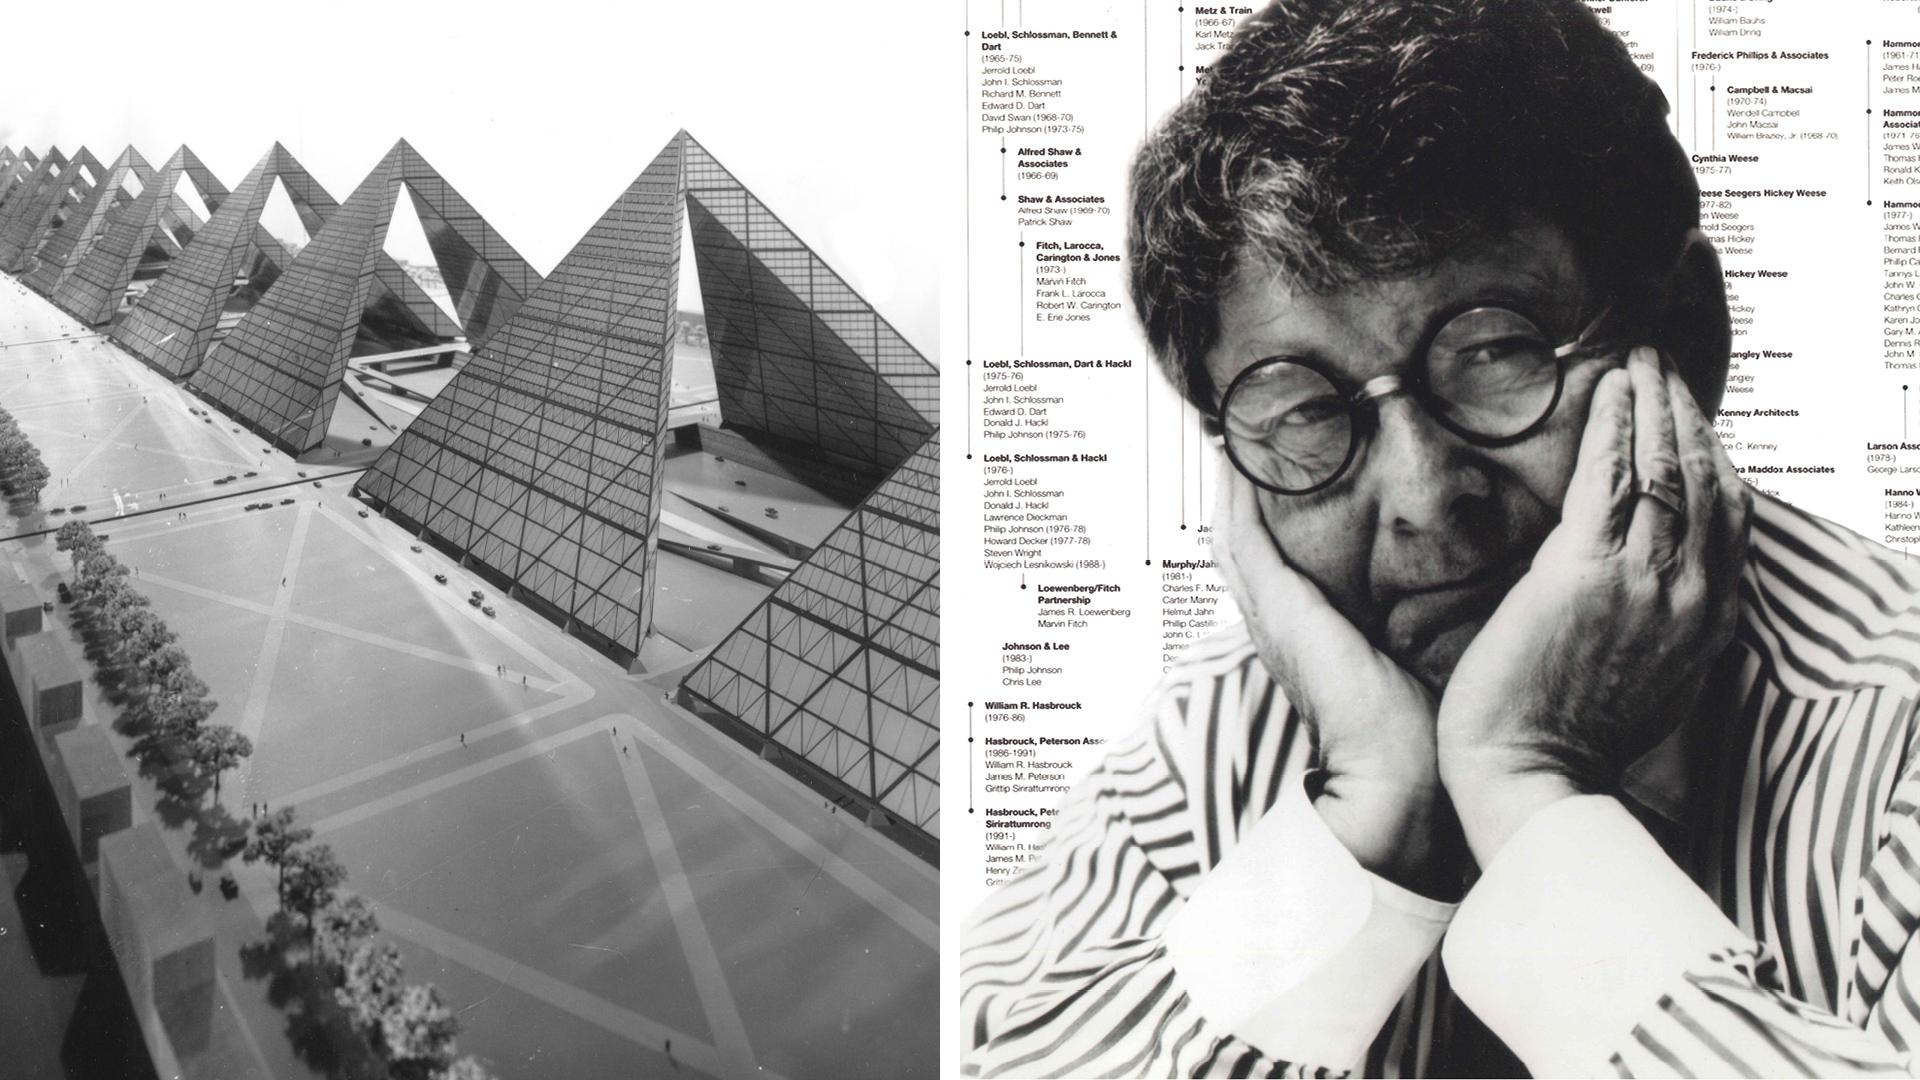 Instant City Model, 1966 | Stanley Tigerman | Vladimir Belogolovsky | STIR, Stanley Tigerman |  Vladimir Belogolovsky | STIR